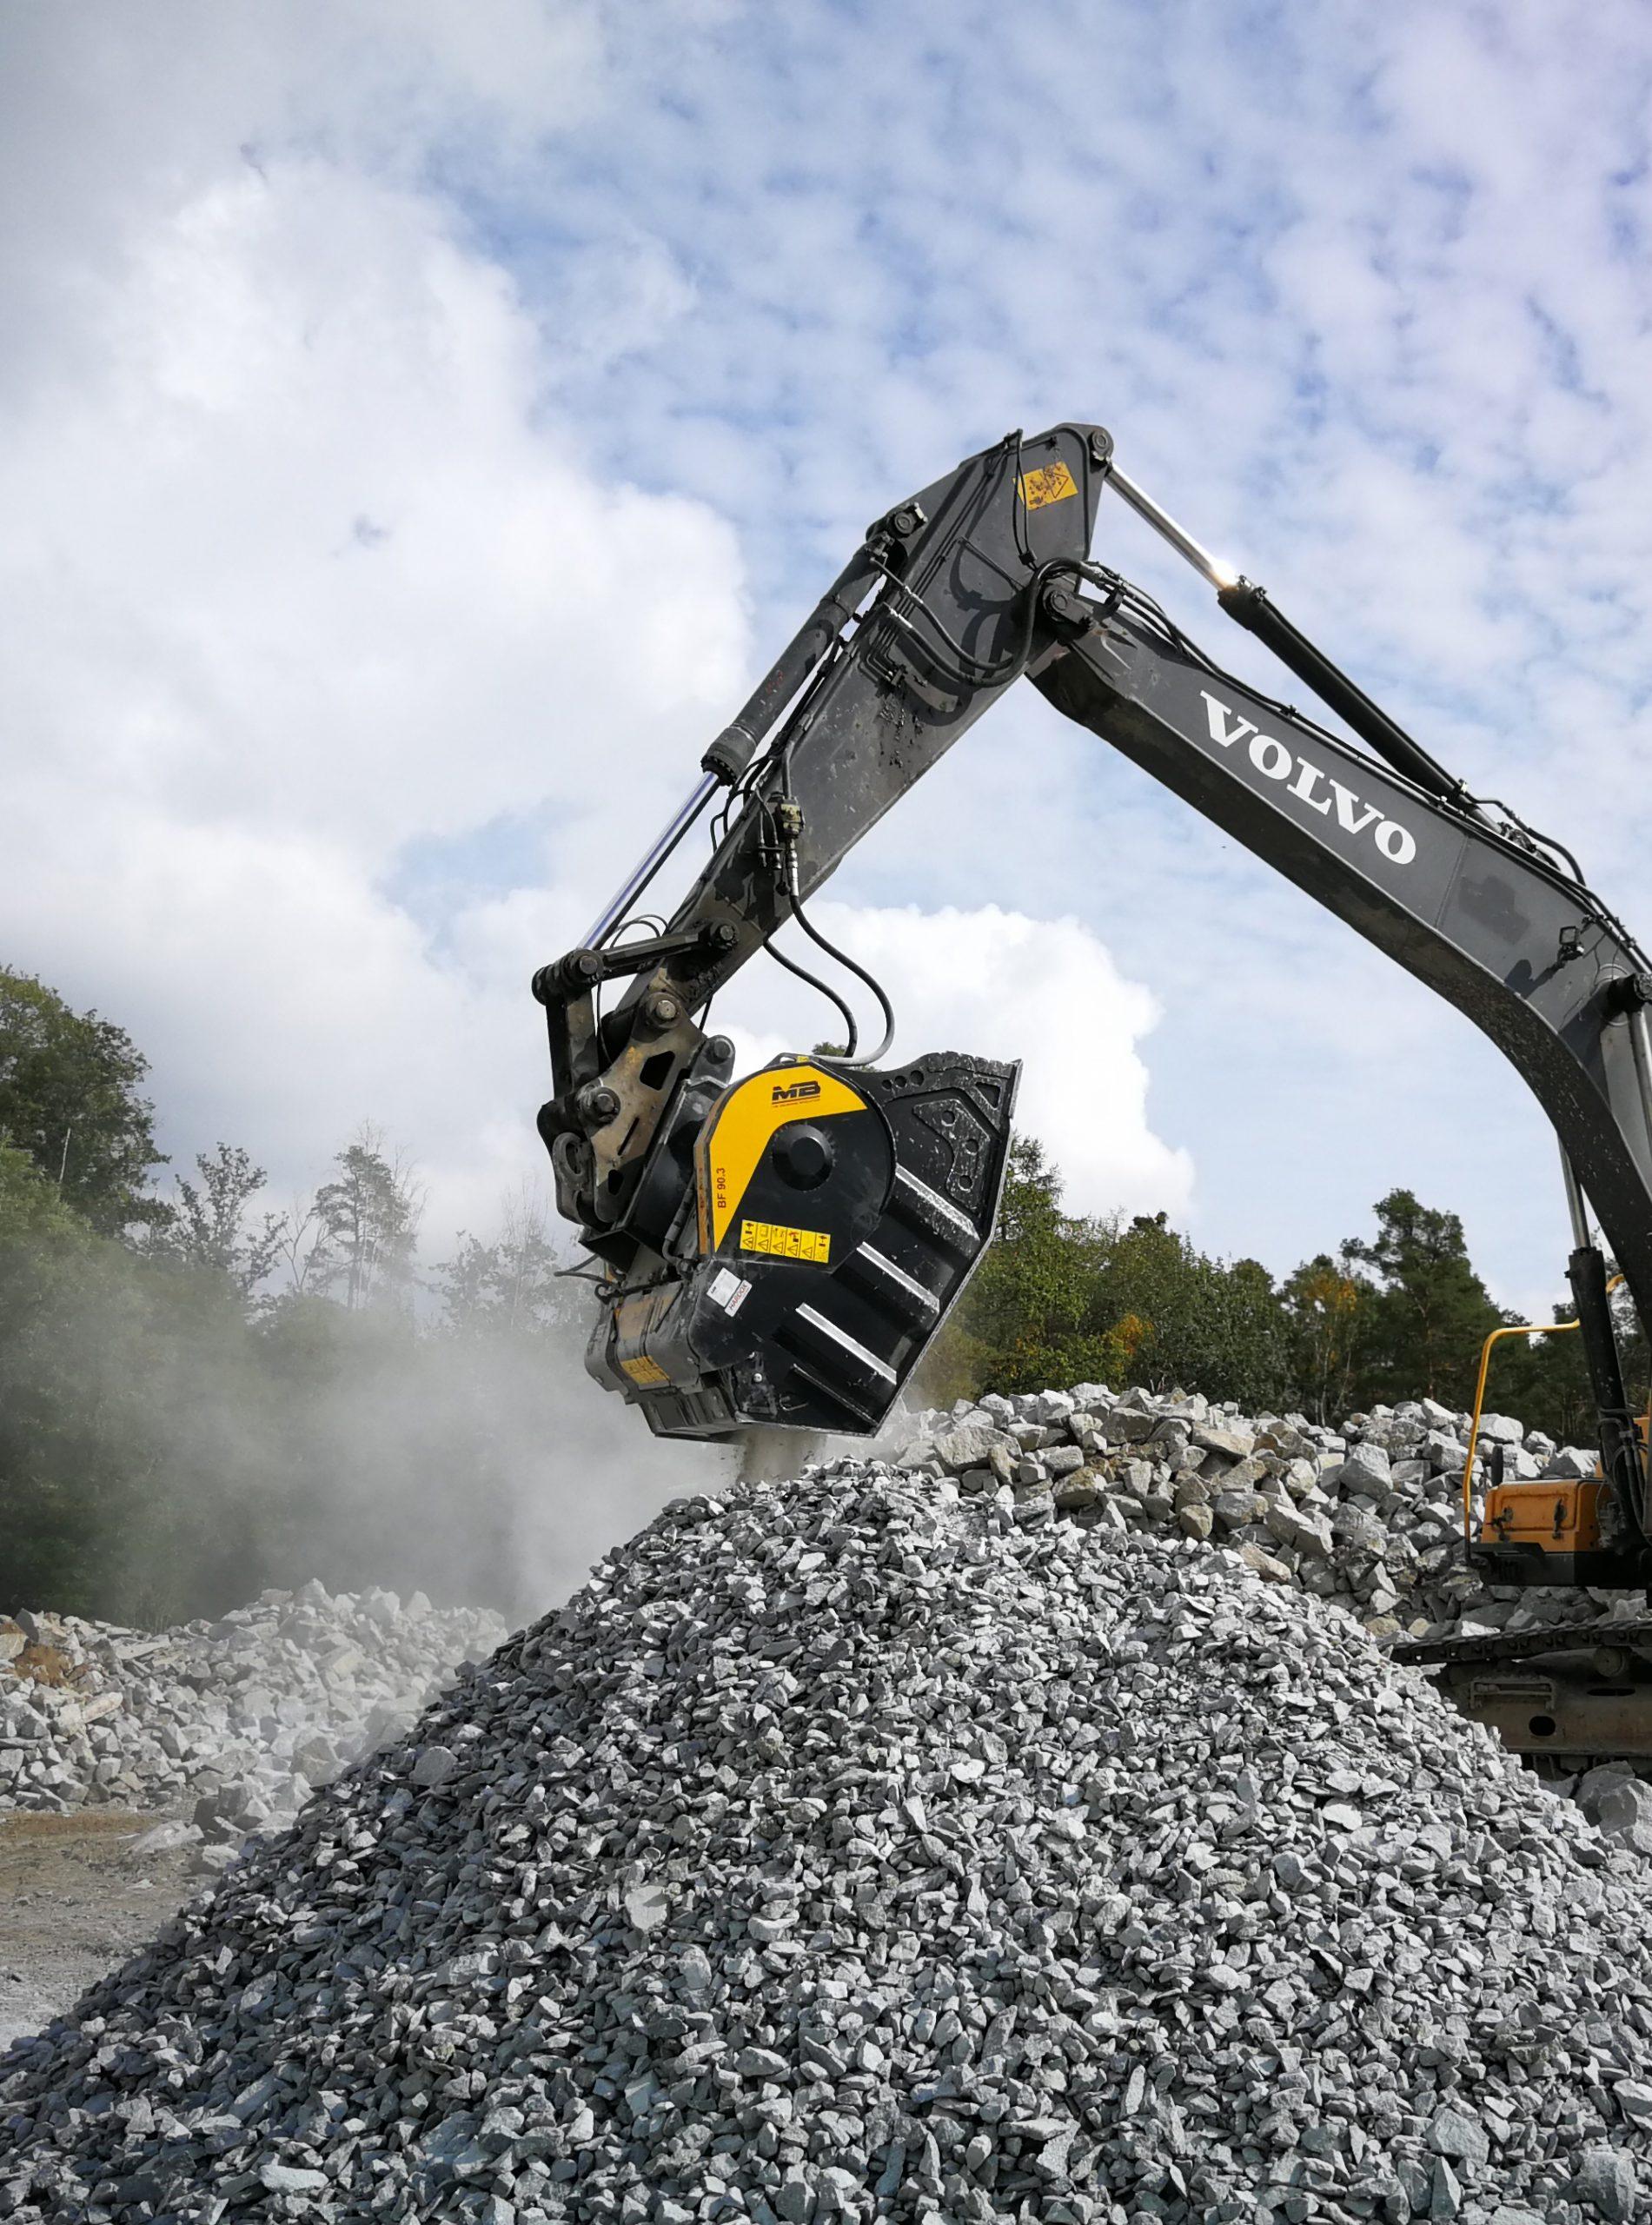 benna frantoio per escavatore a noleggio